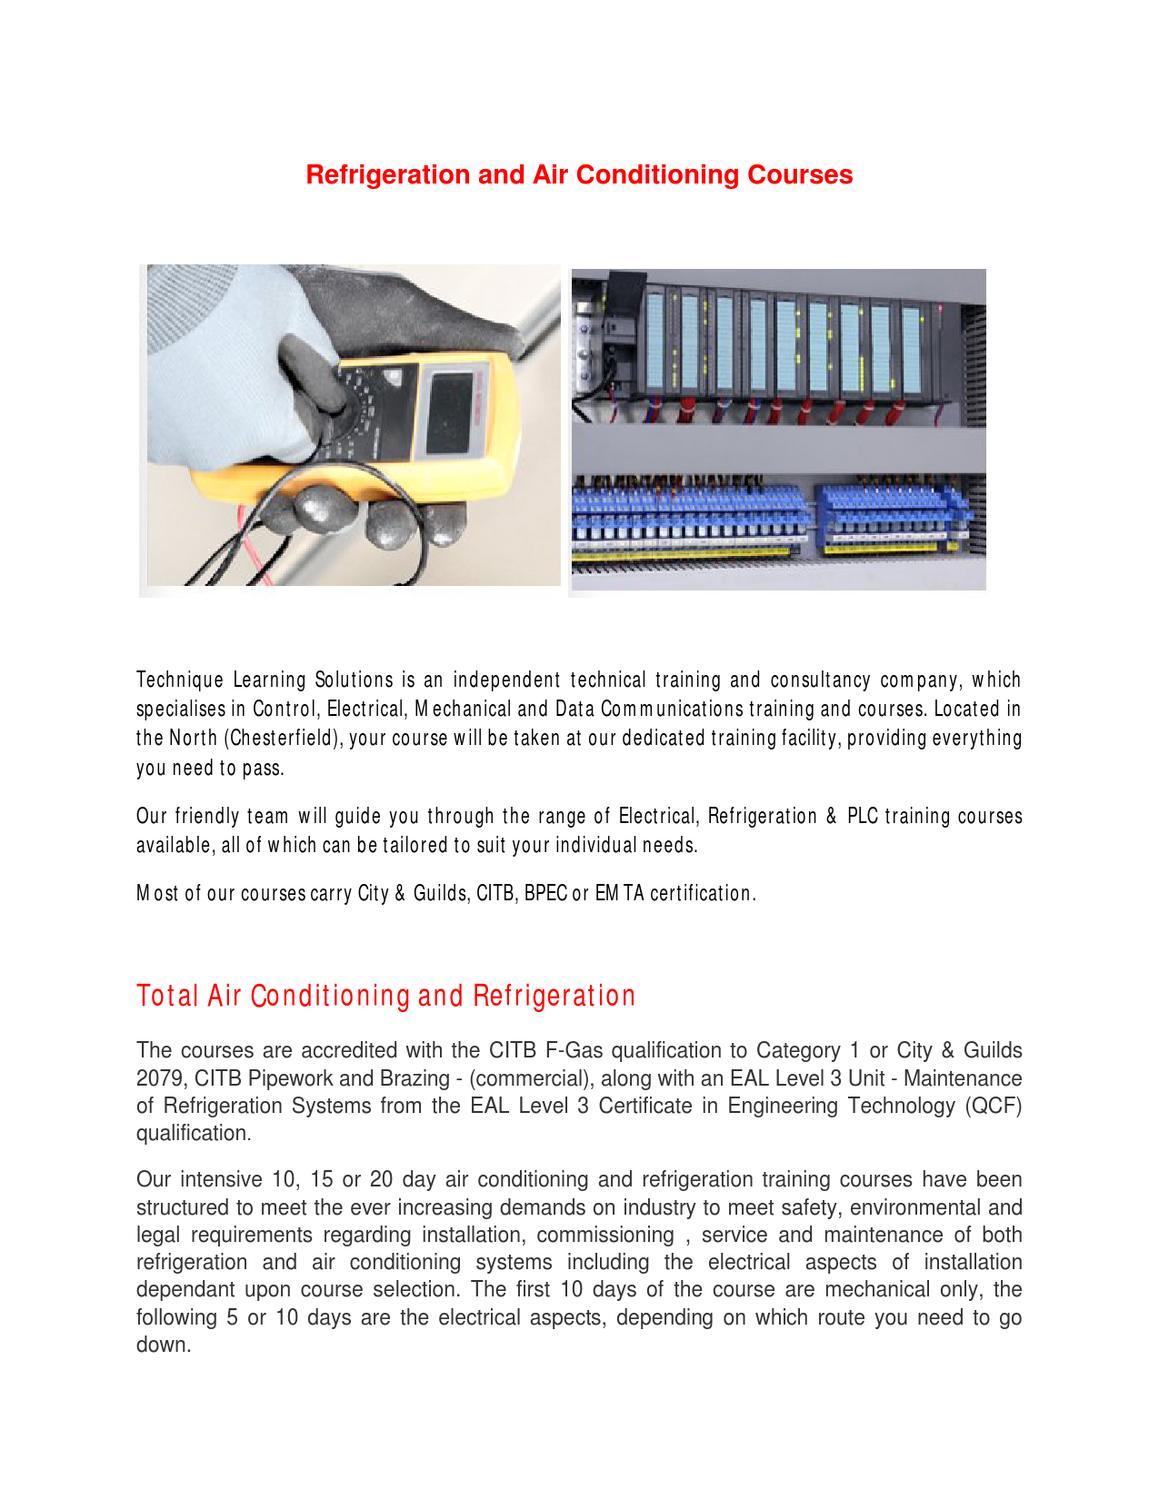 Refrigeration course by divya rai - issuu